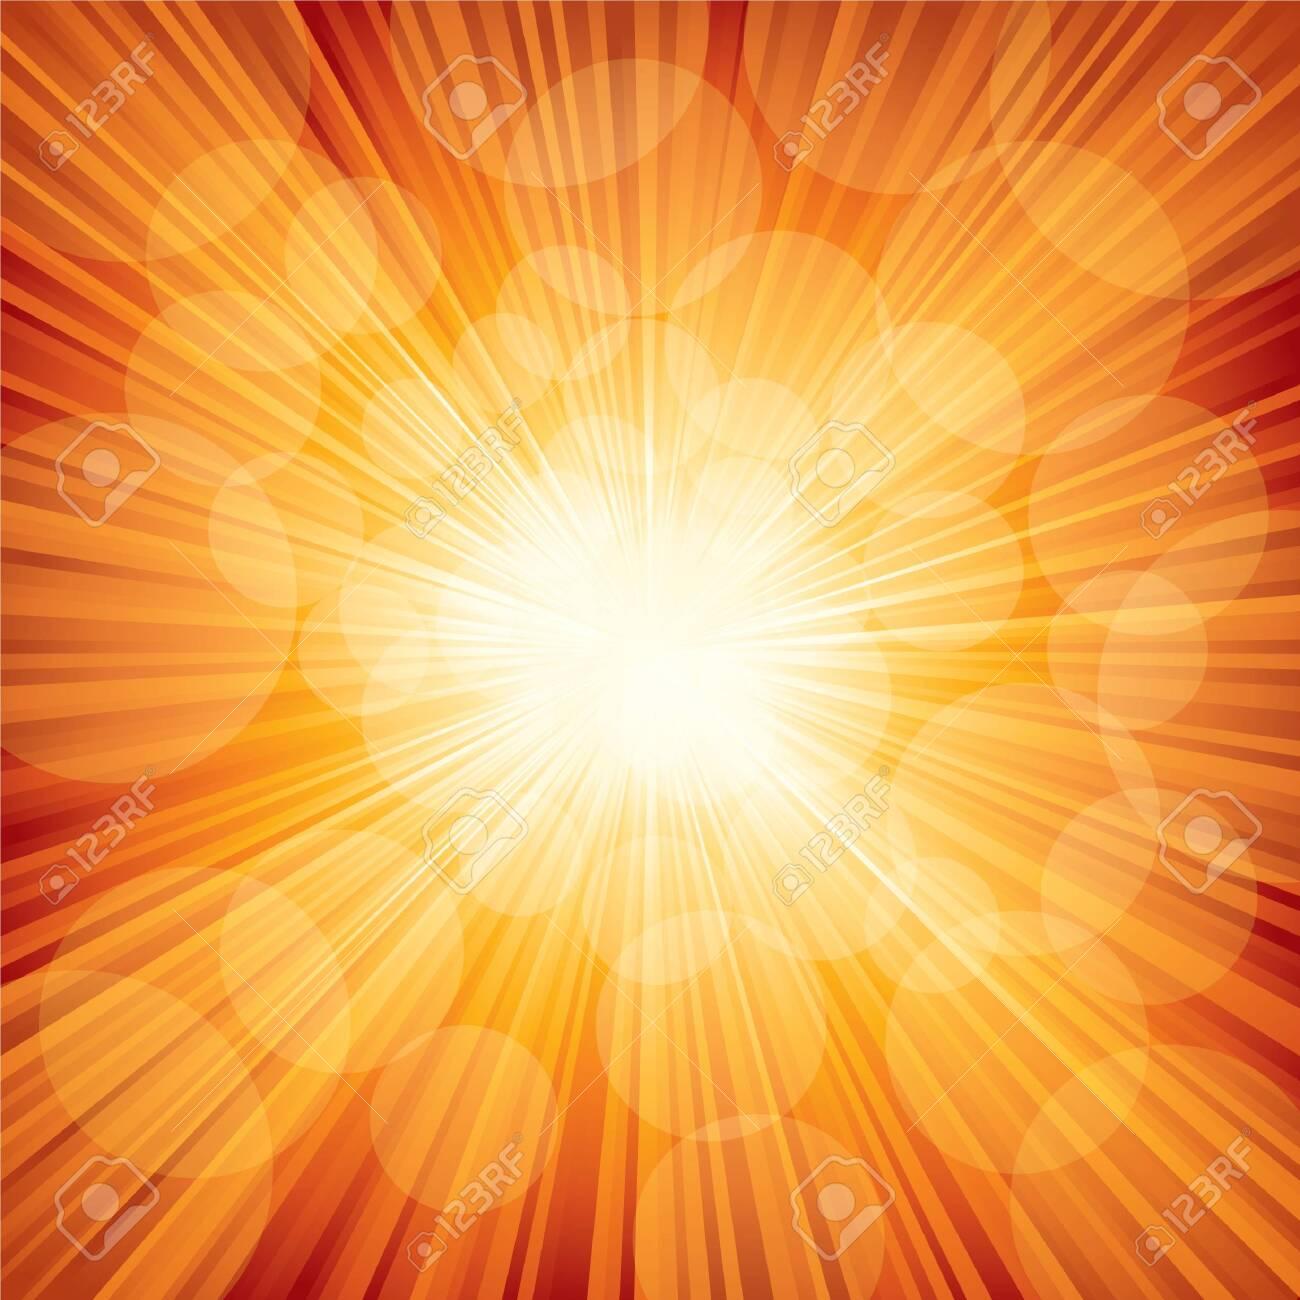 Vector illustration of orange sunbeam. - 150586221